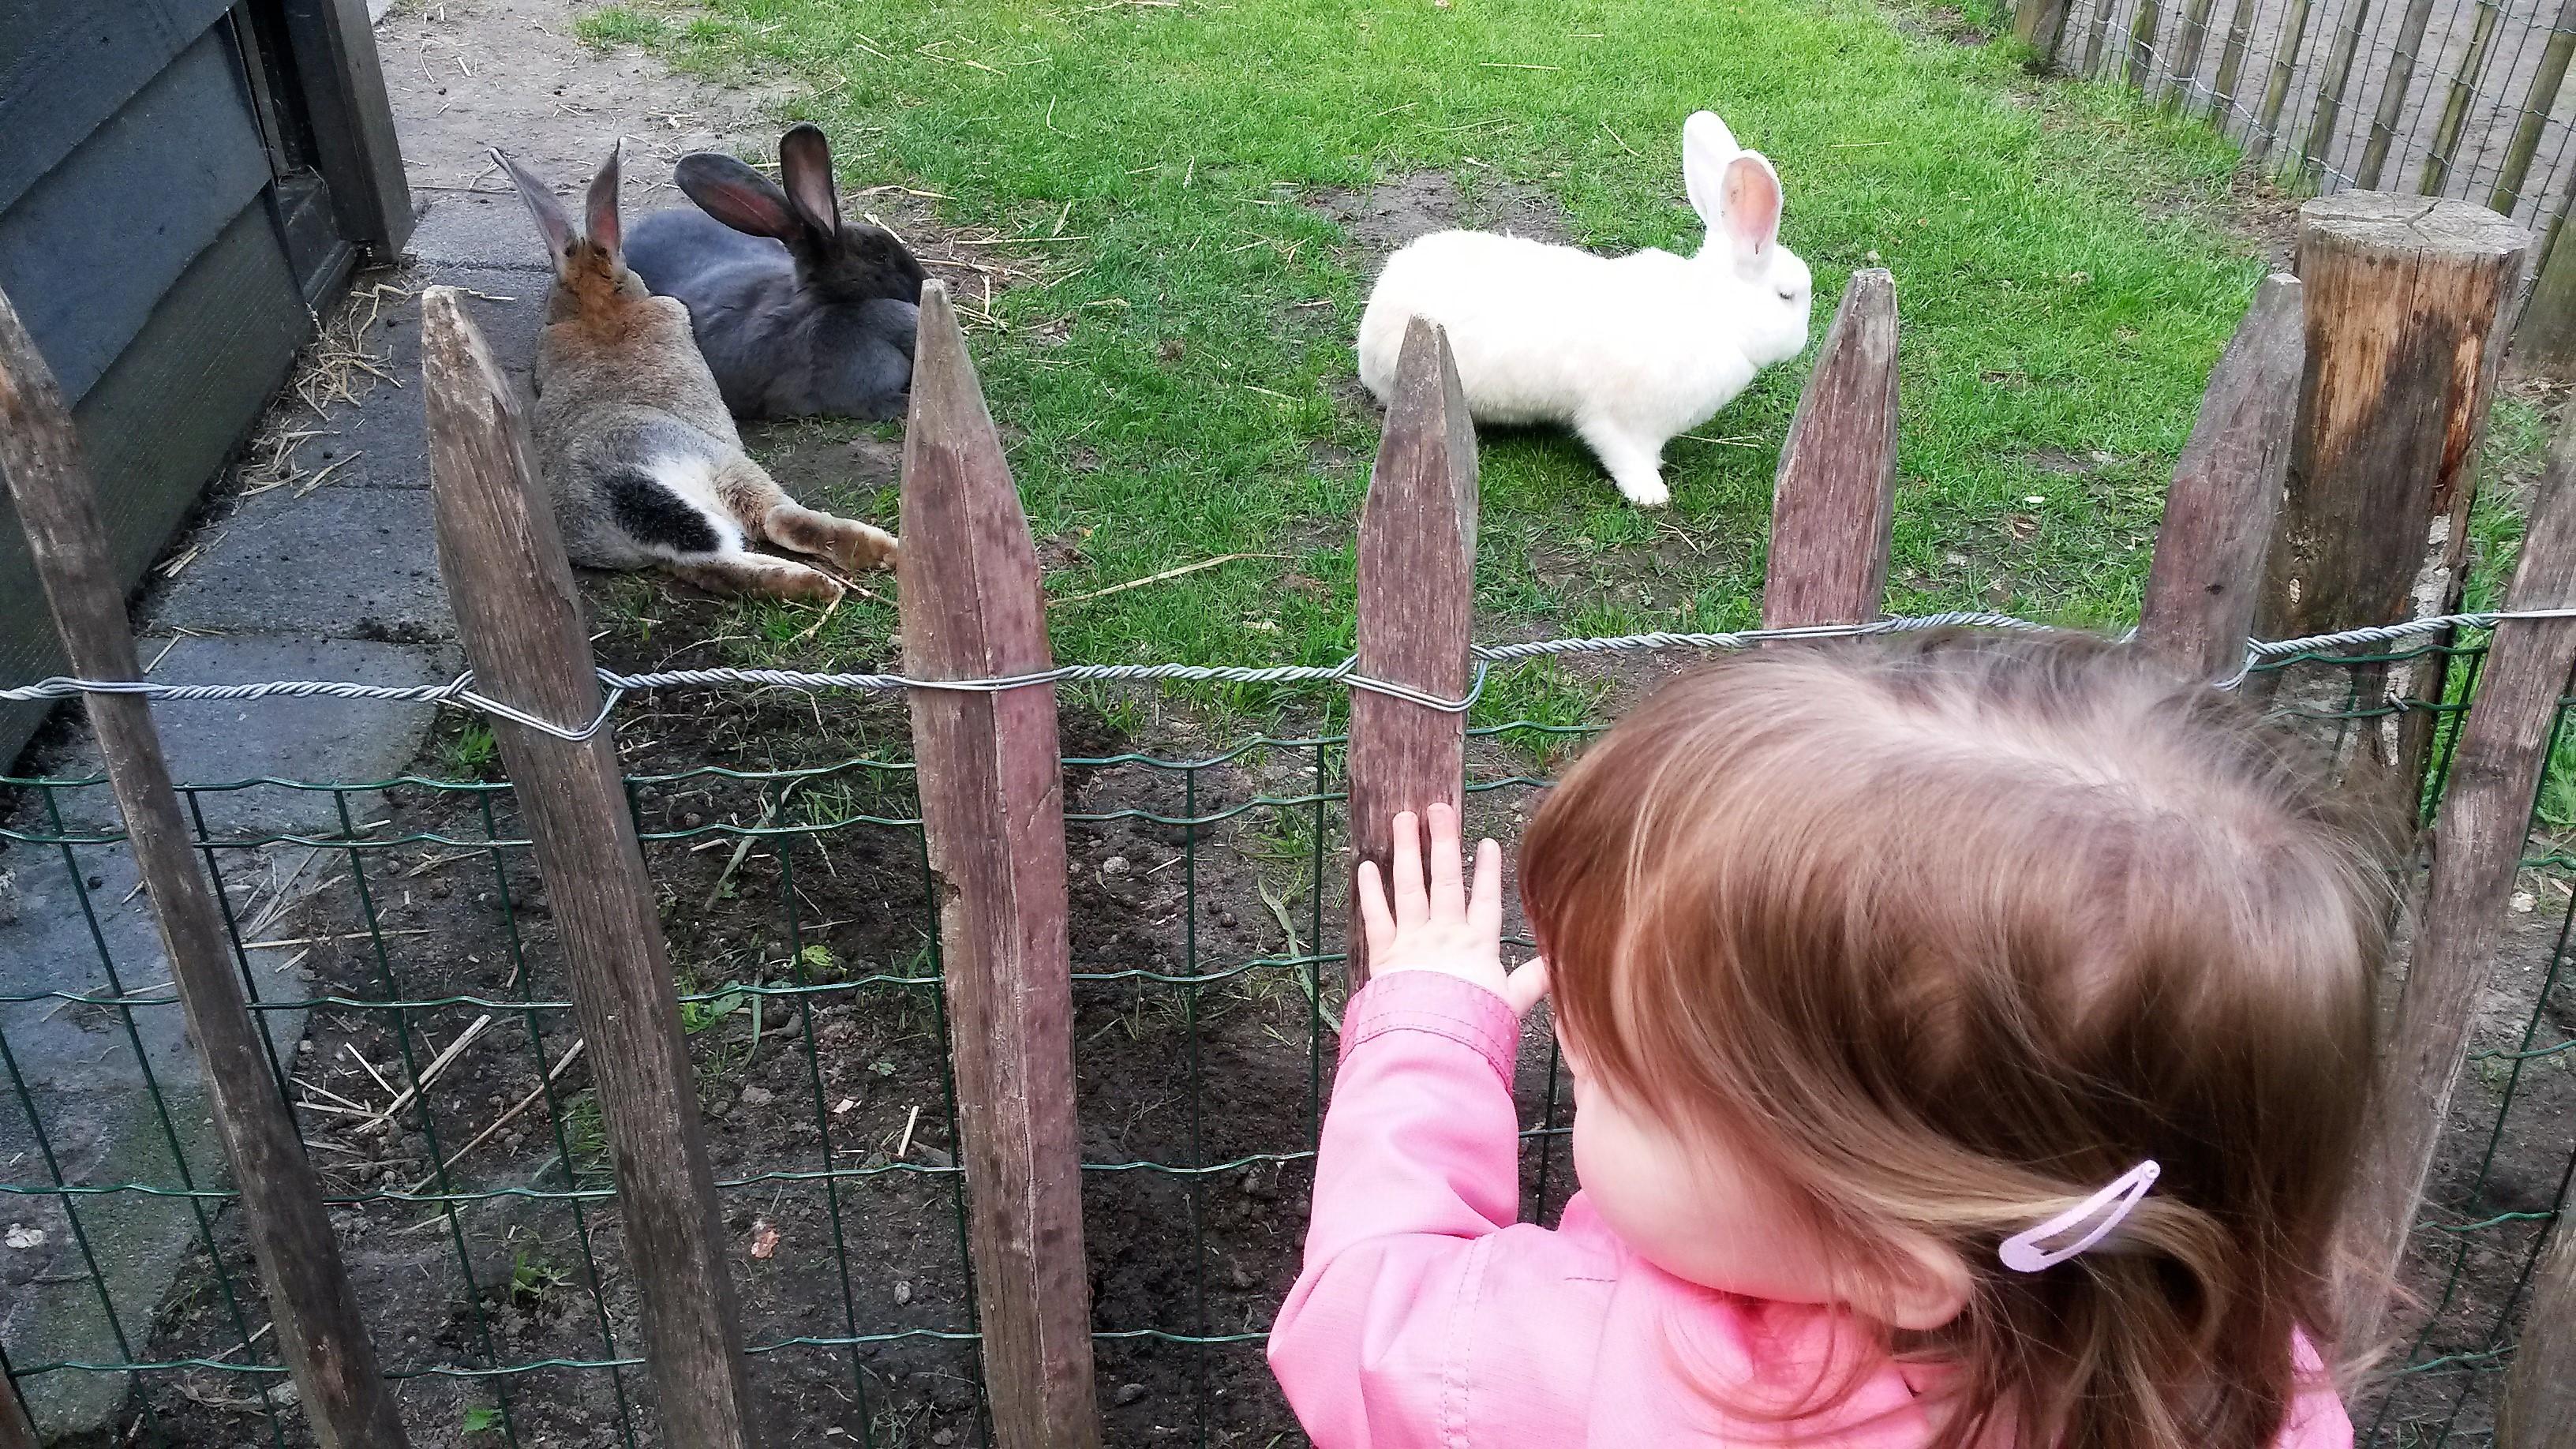 kinderboerderij, boerderij, dieren, Wolfslaar, Breda, kinderen, gezin, uitje, blog, mamablog, mamalifestyle blog, La Log